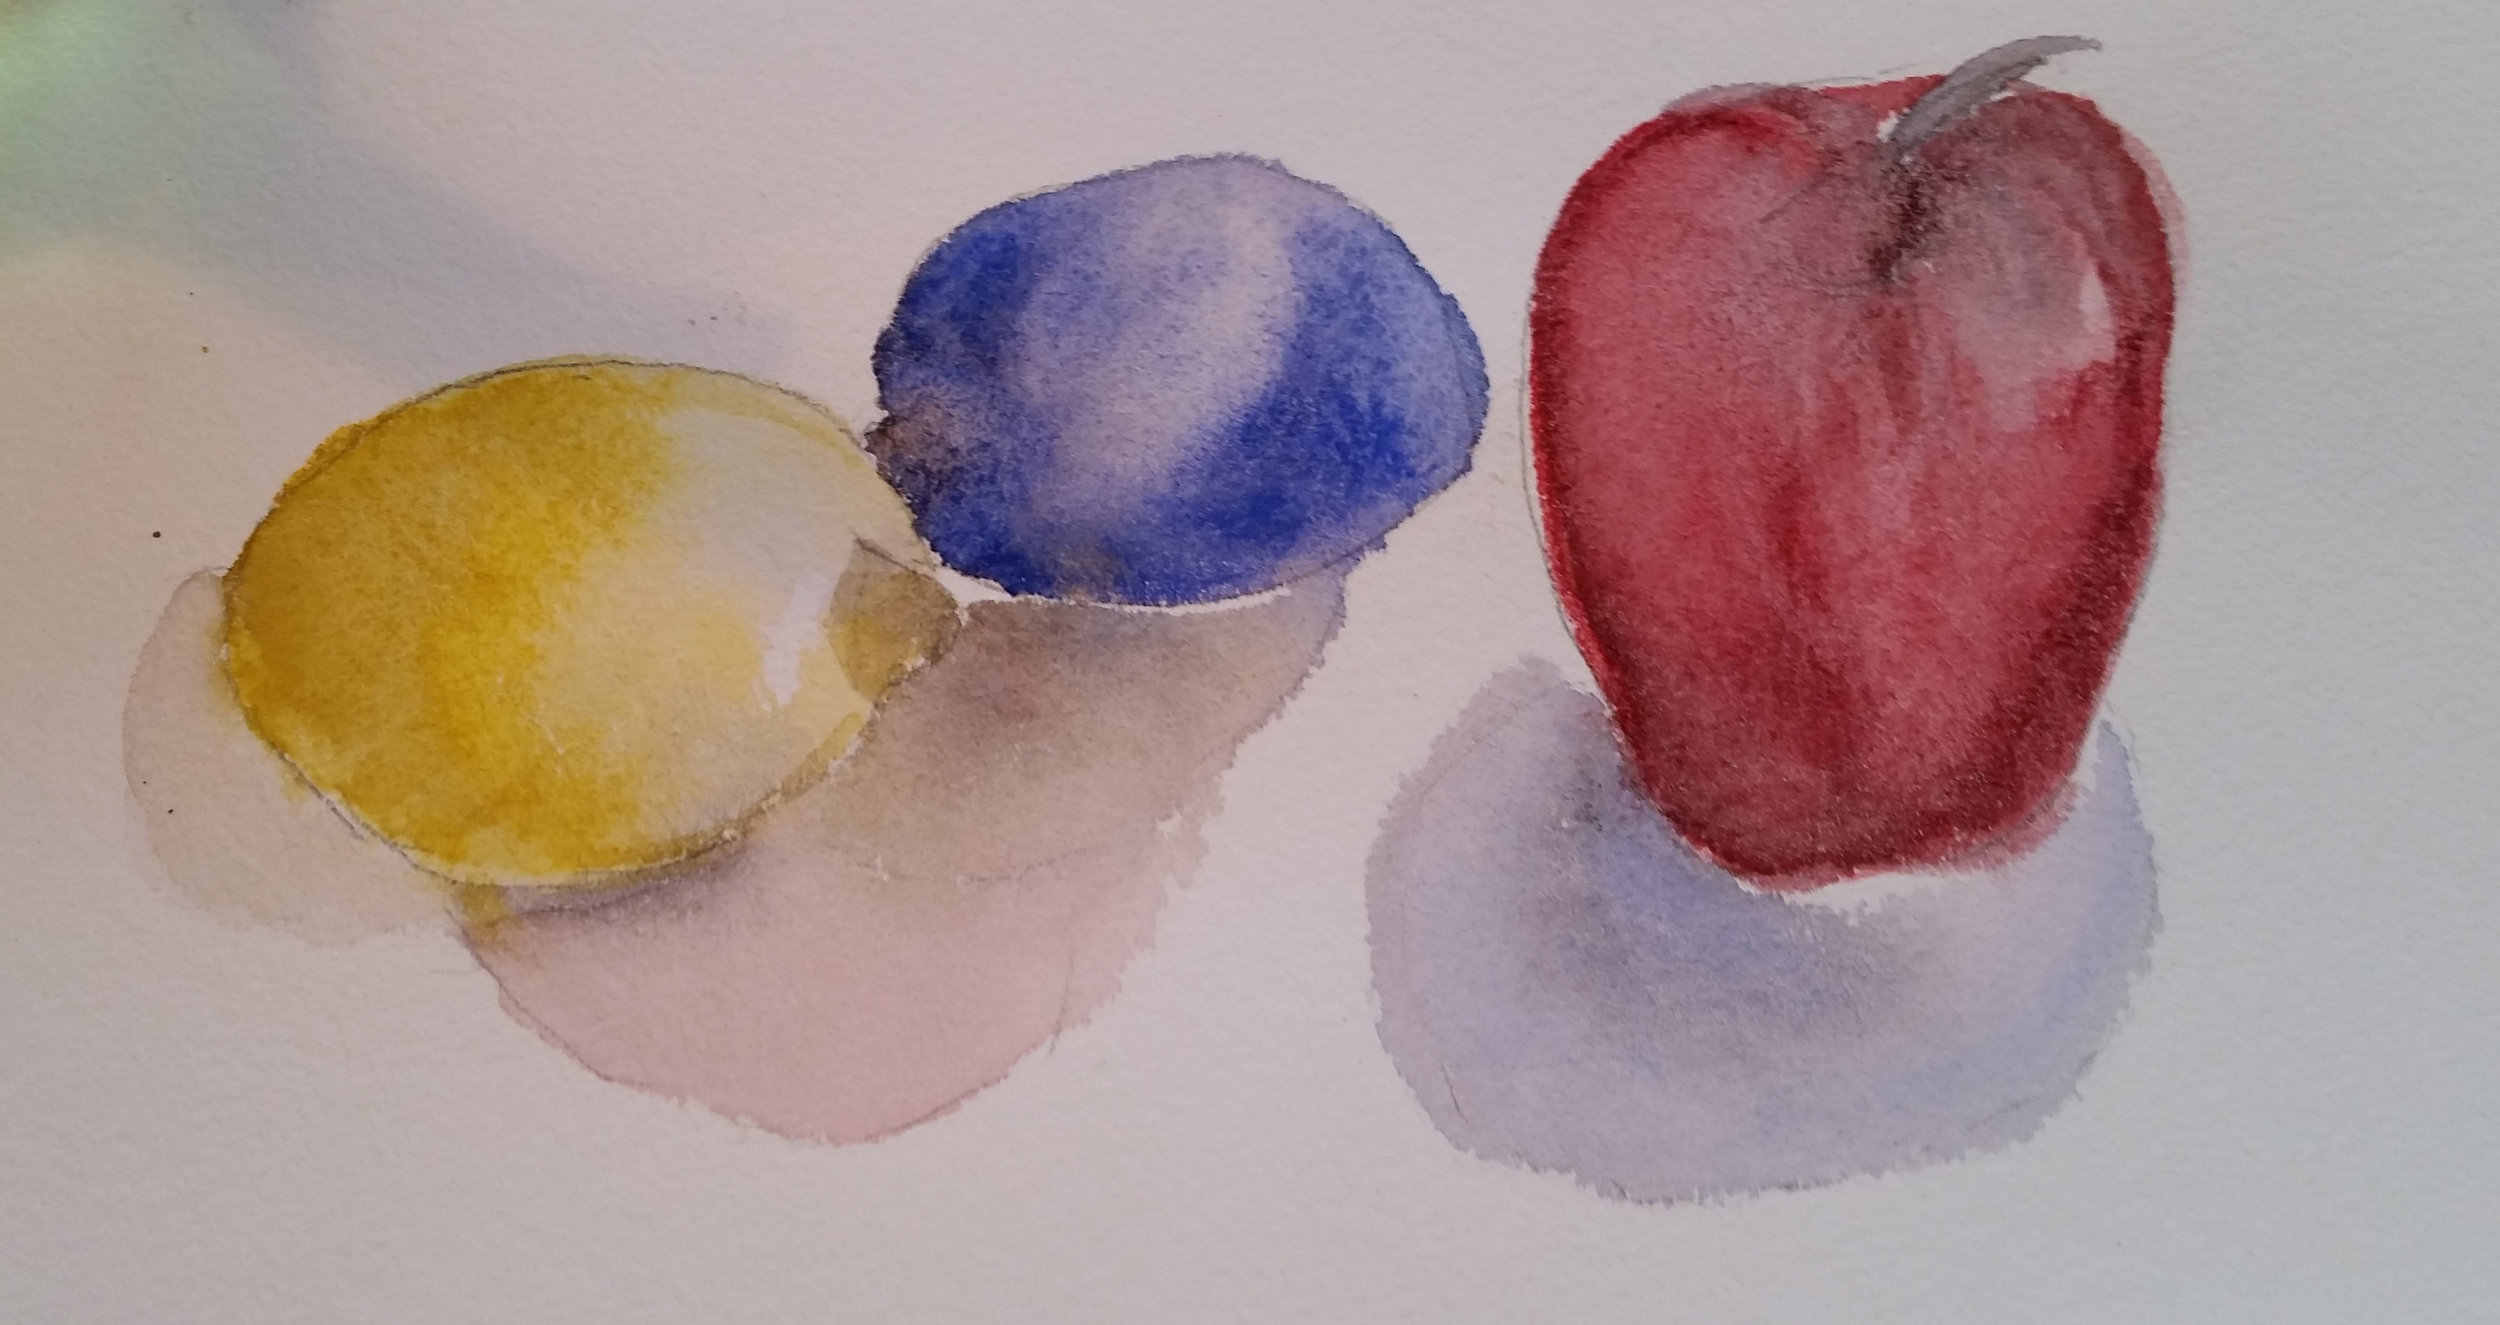 Apples Cheryl crop.jpg